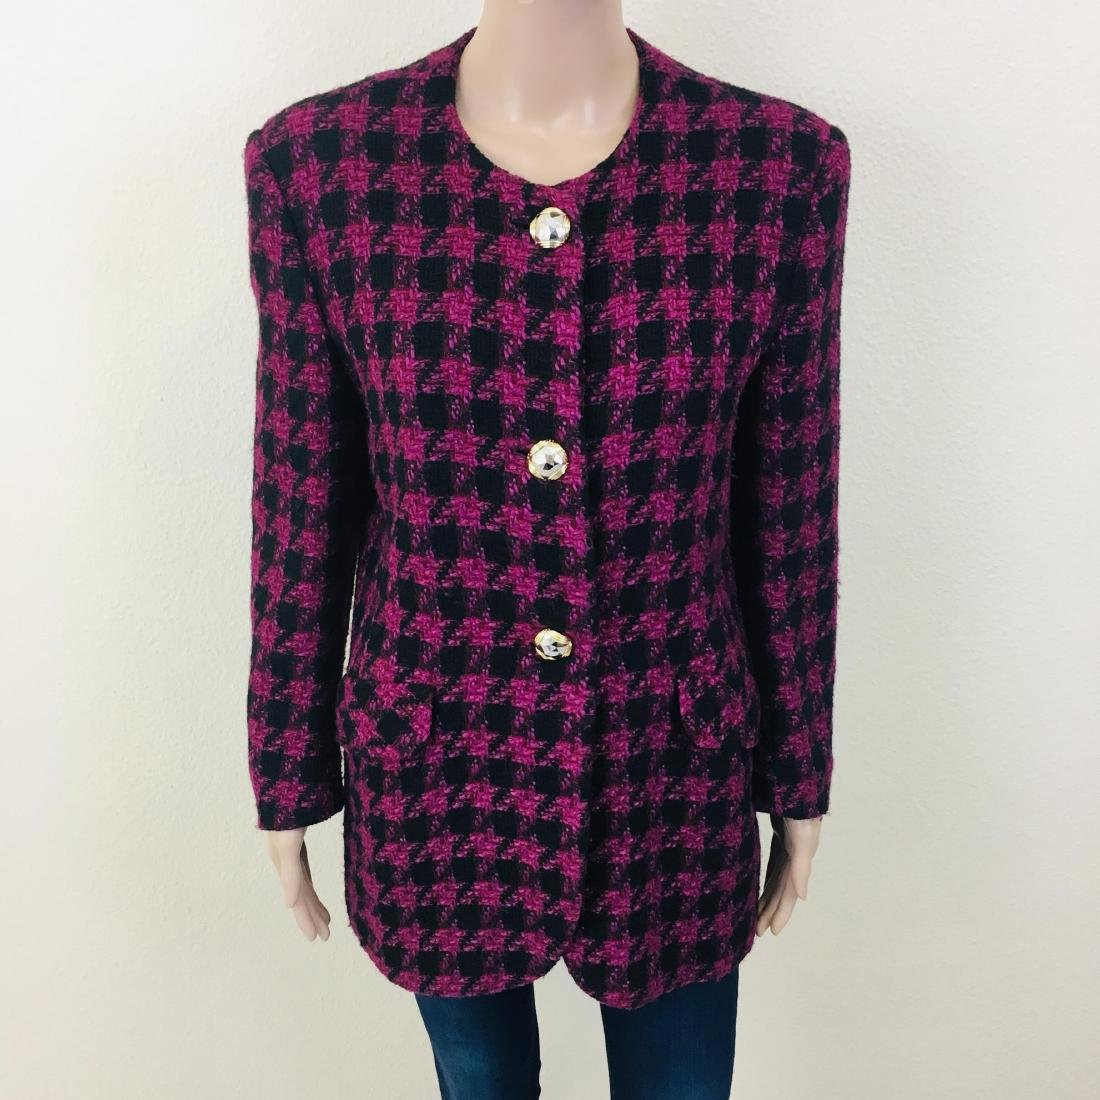 Vintage Women's Uknown Italian Designer Wool Blend - 4